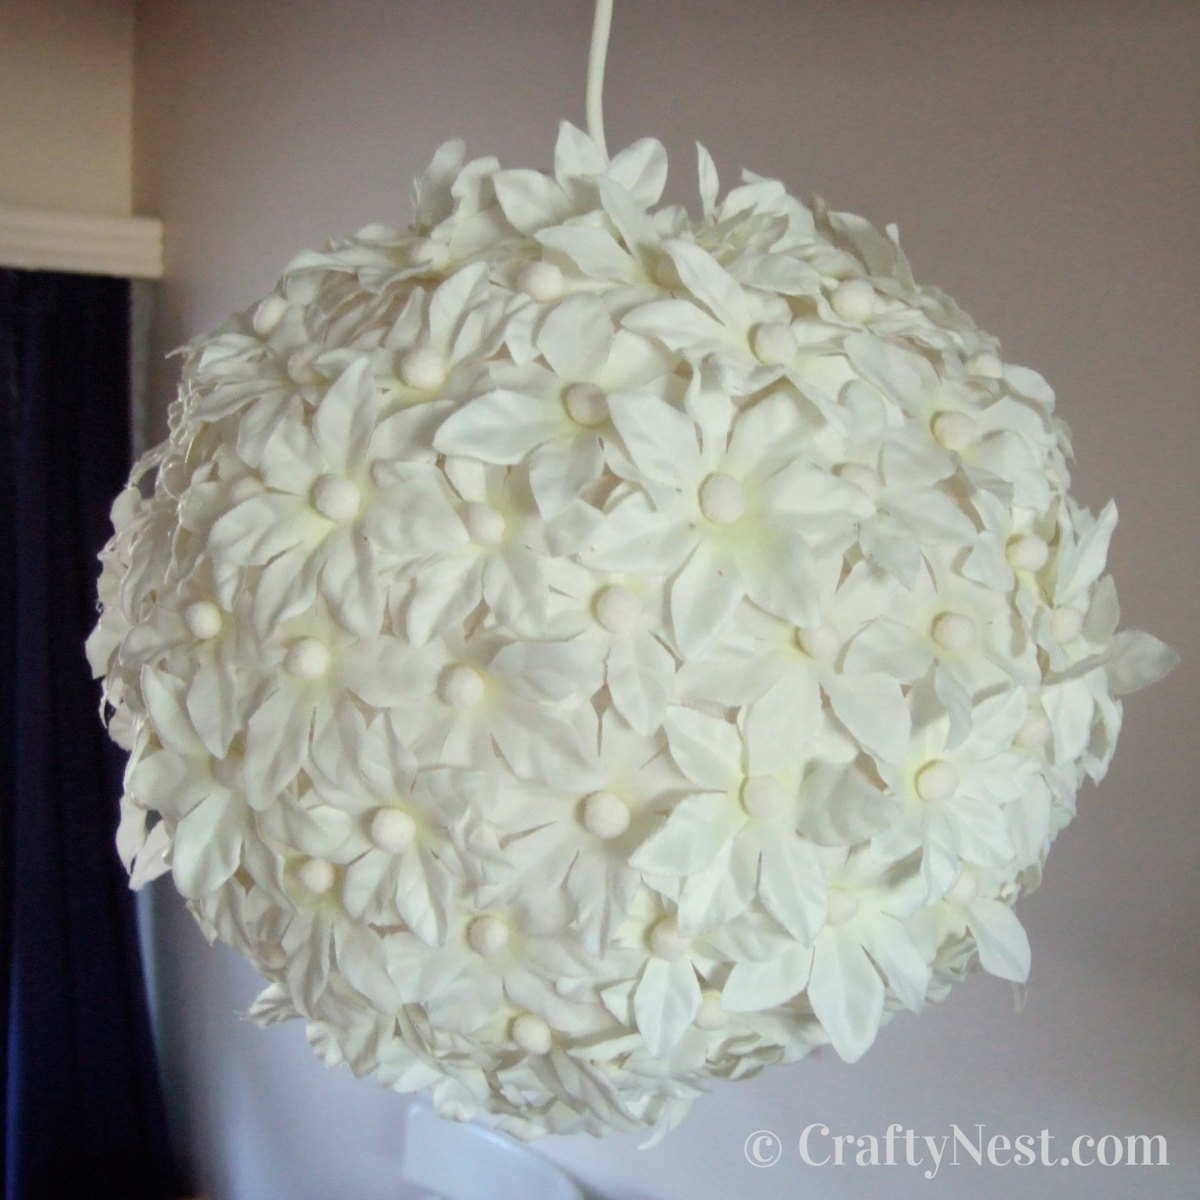 Hang the flower lantern, photo